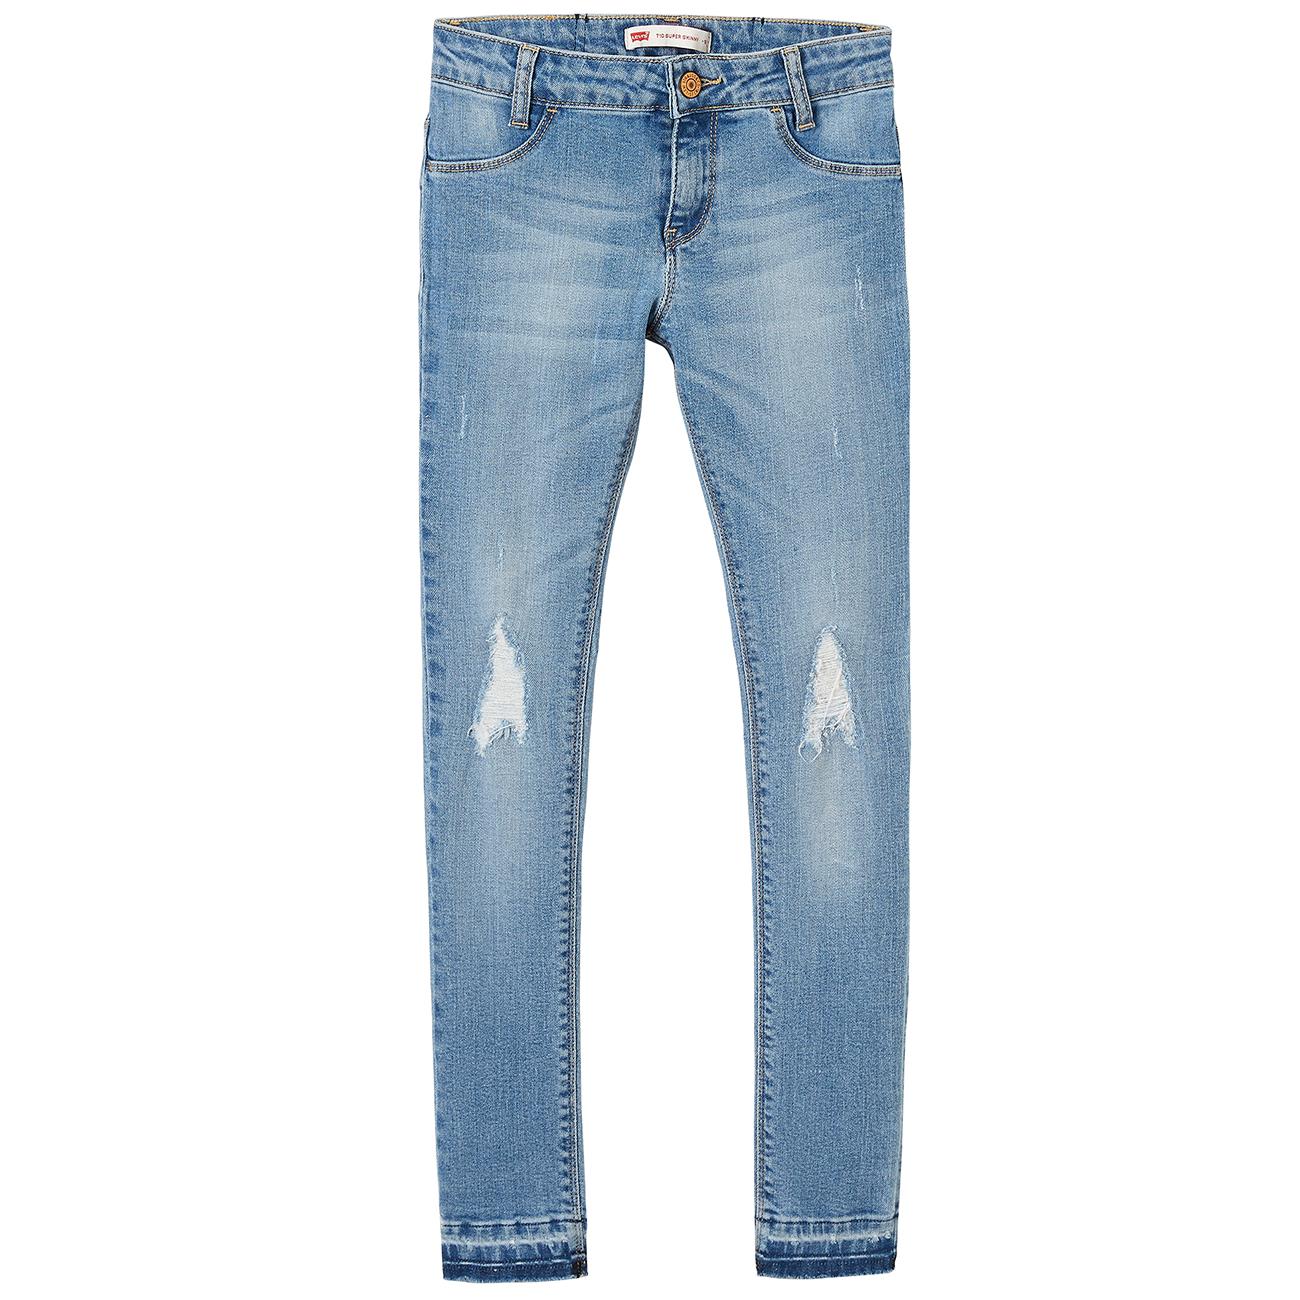 487cdd35 Levi's 710 Pant Super Skinny Indigo